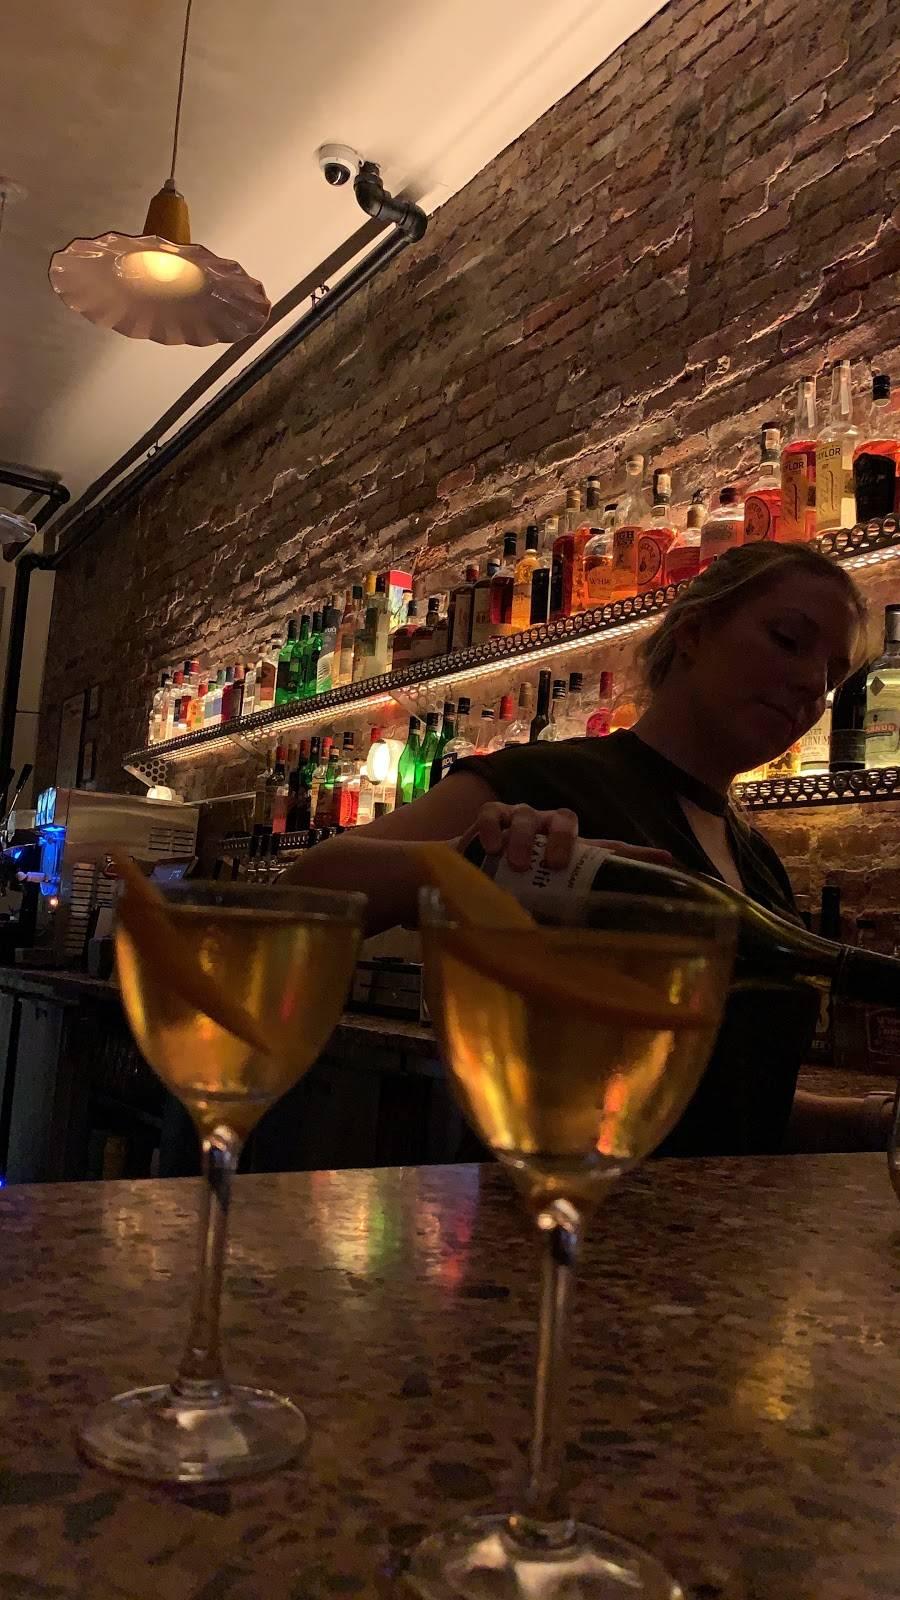 Devon | restaurant | 252 Broome St, New York, NY 10002, USA | 2124273997 OR +1 212-427-3997